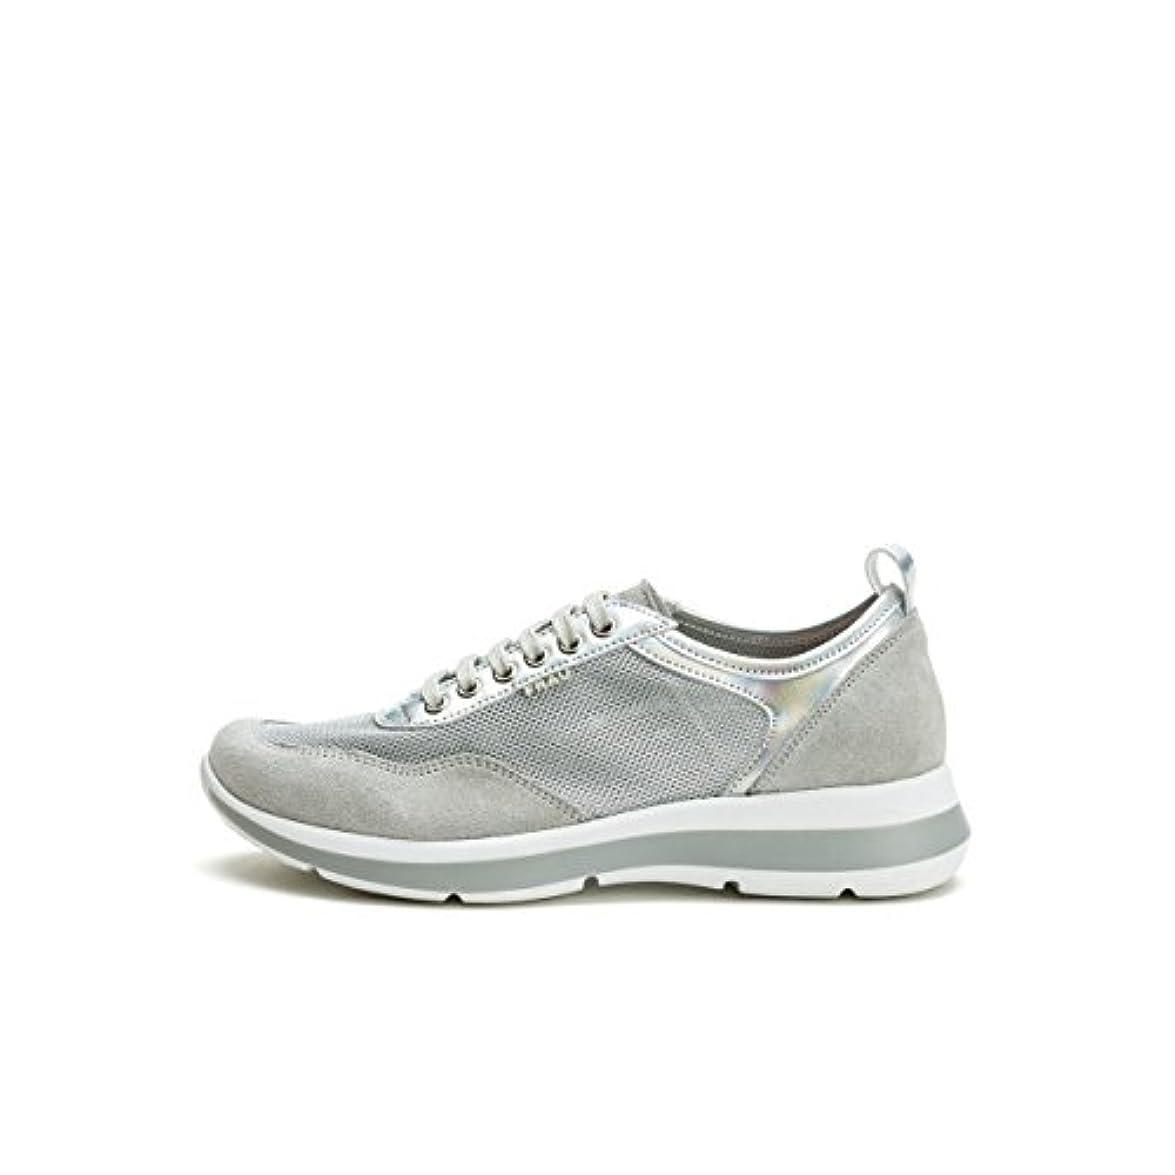 Frau 42s4 Grigio Scarpa Donna Sneaker